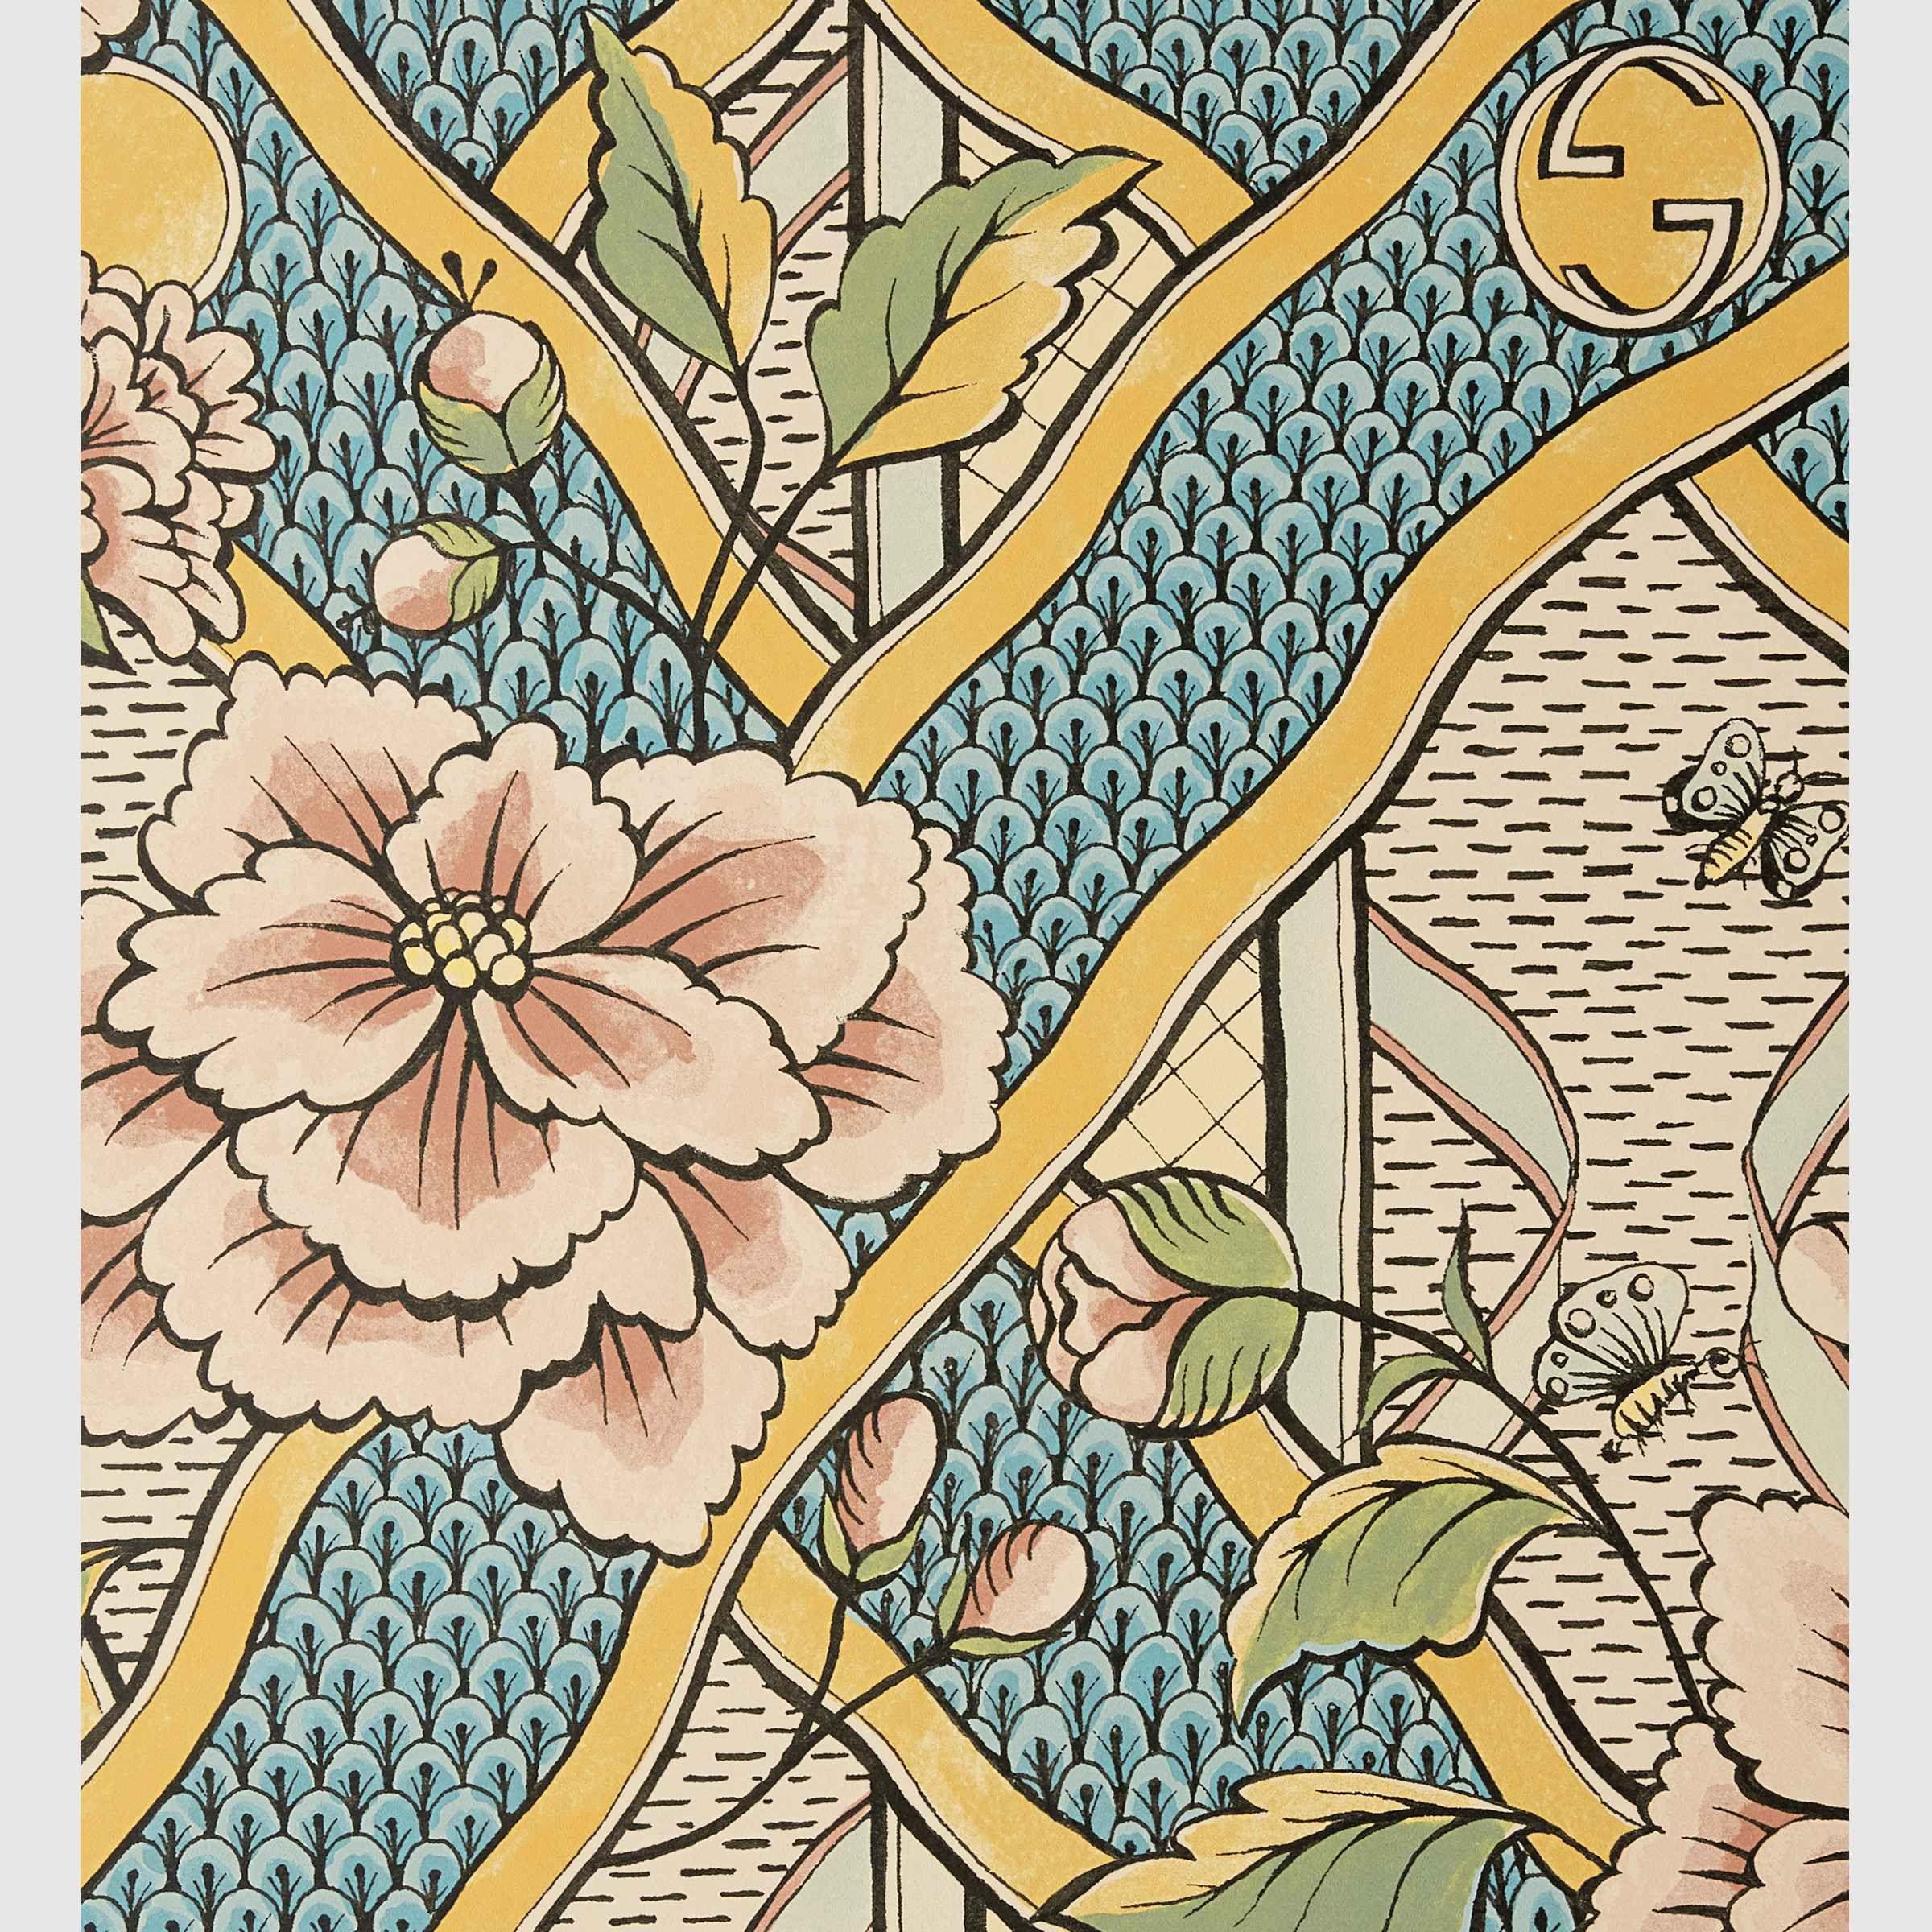 Gucci Floral print wallpaper in 2020 Floral print